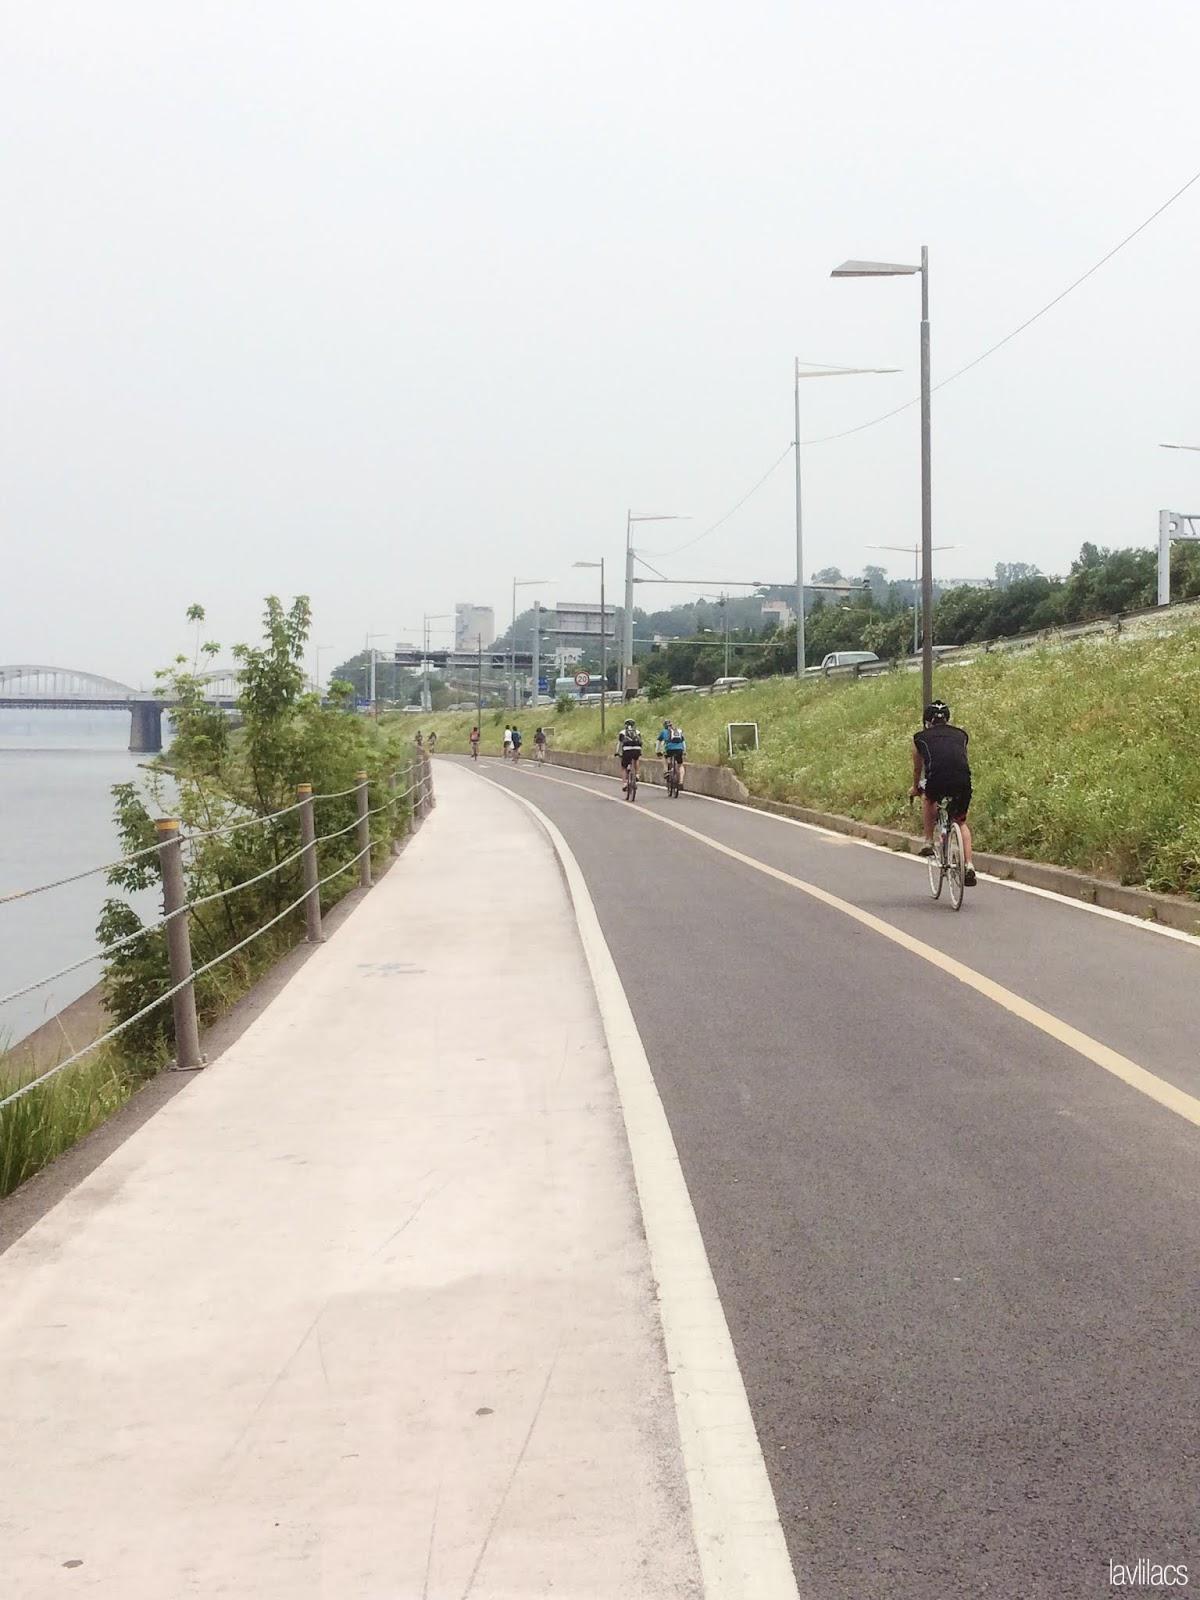 Seoul, Korea - Summer Study Abroad 2014 - Yeouido Park - biking path along Han River